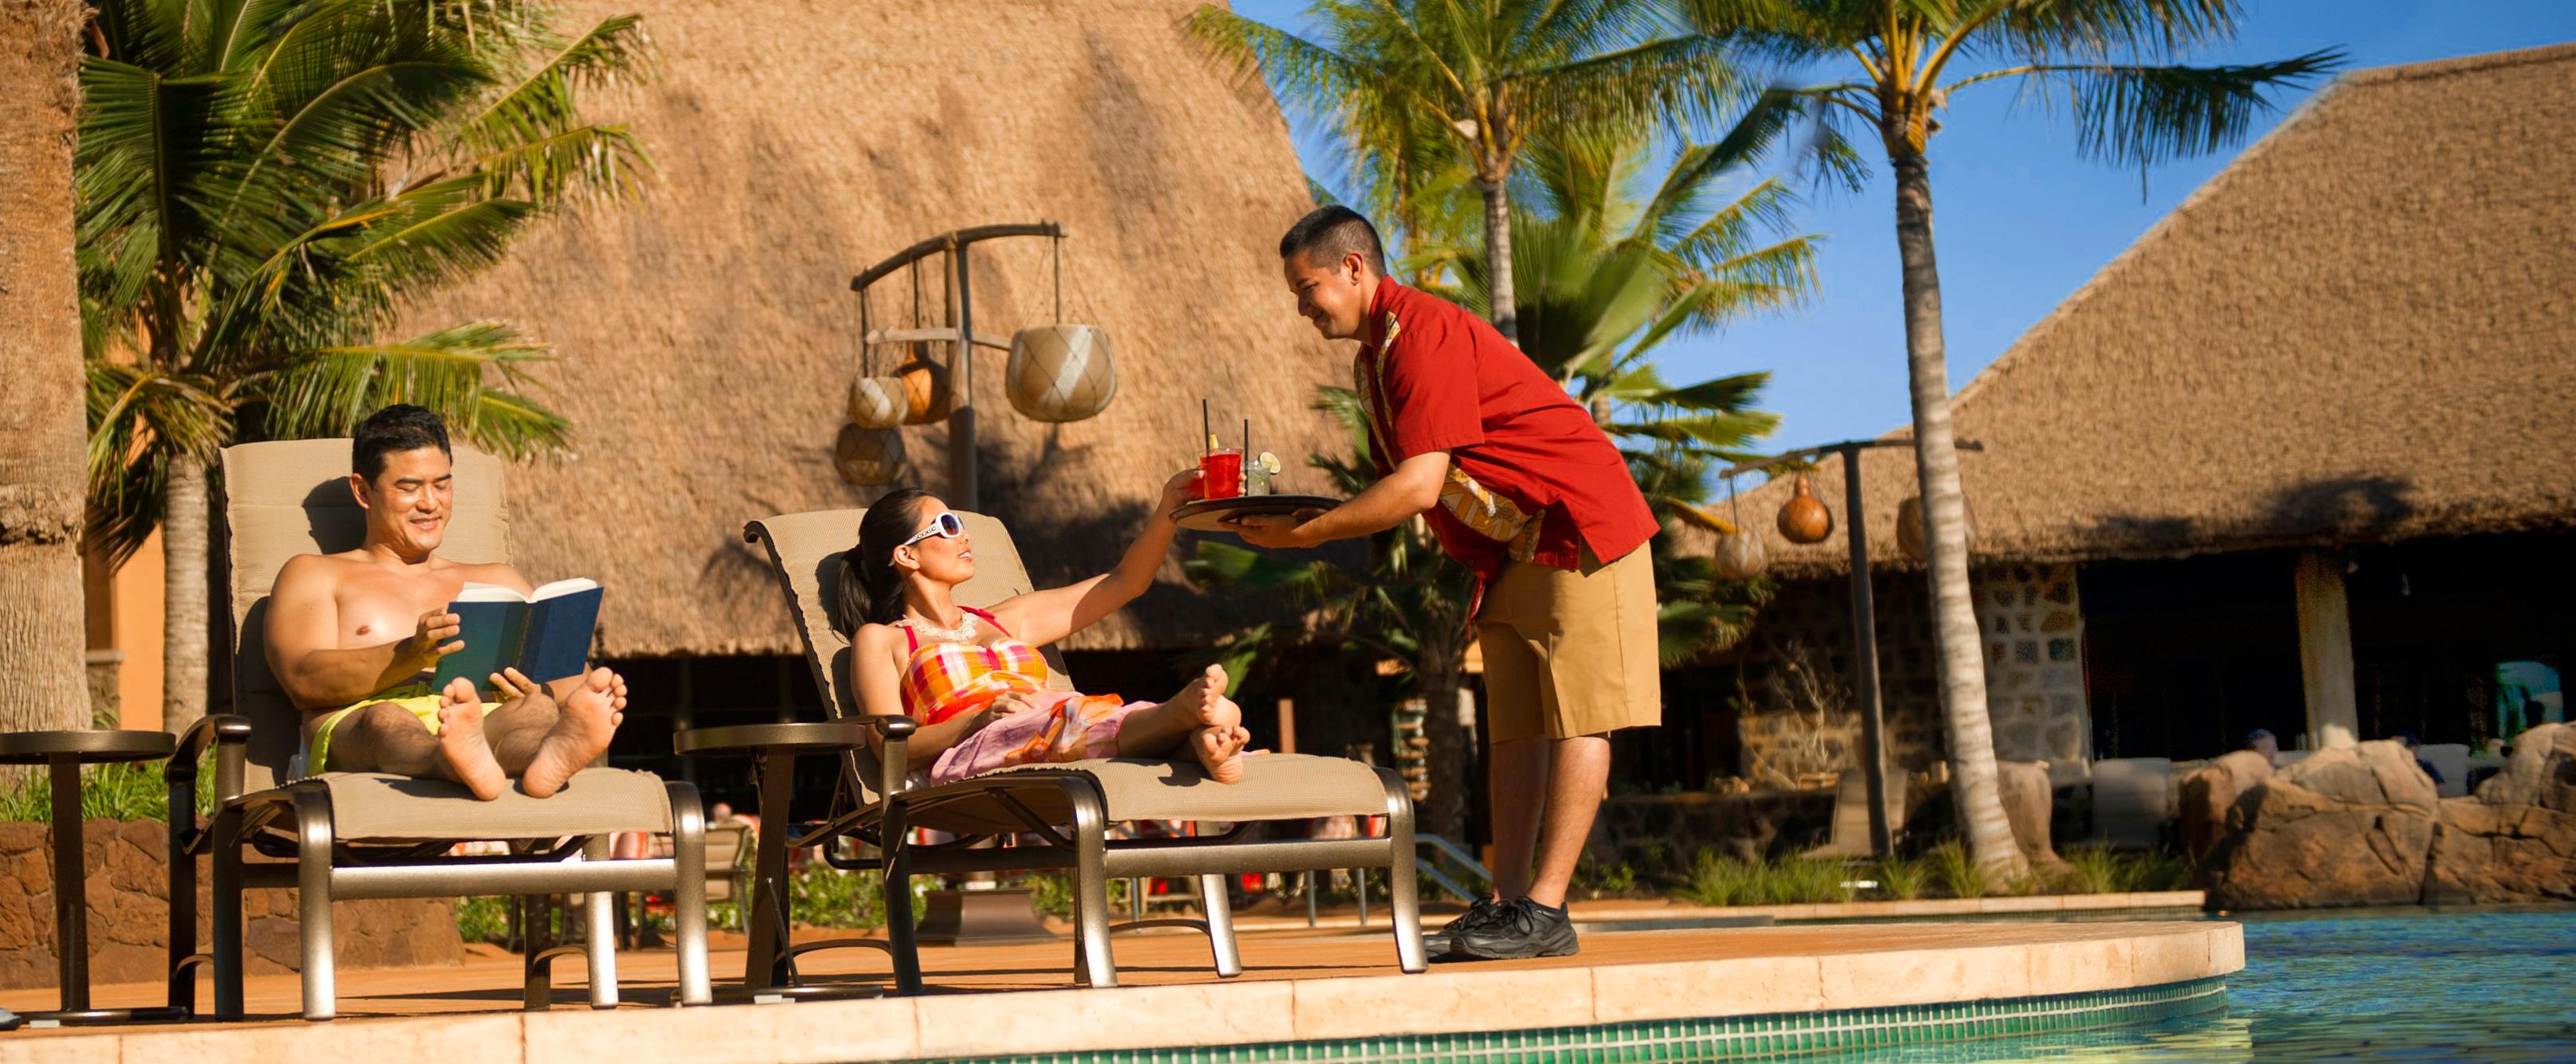 Waikolohe Pool Aulani Hawaii Resort Amp Spa